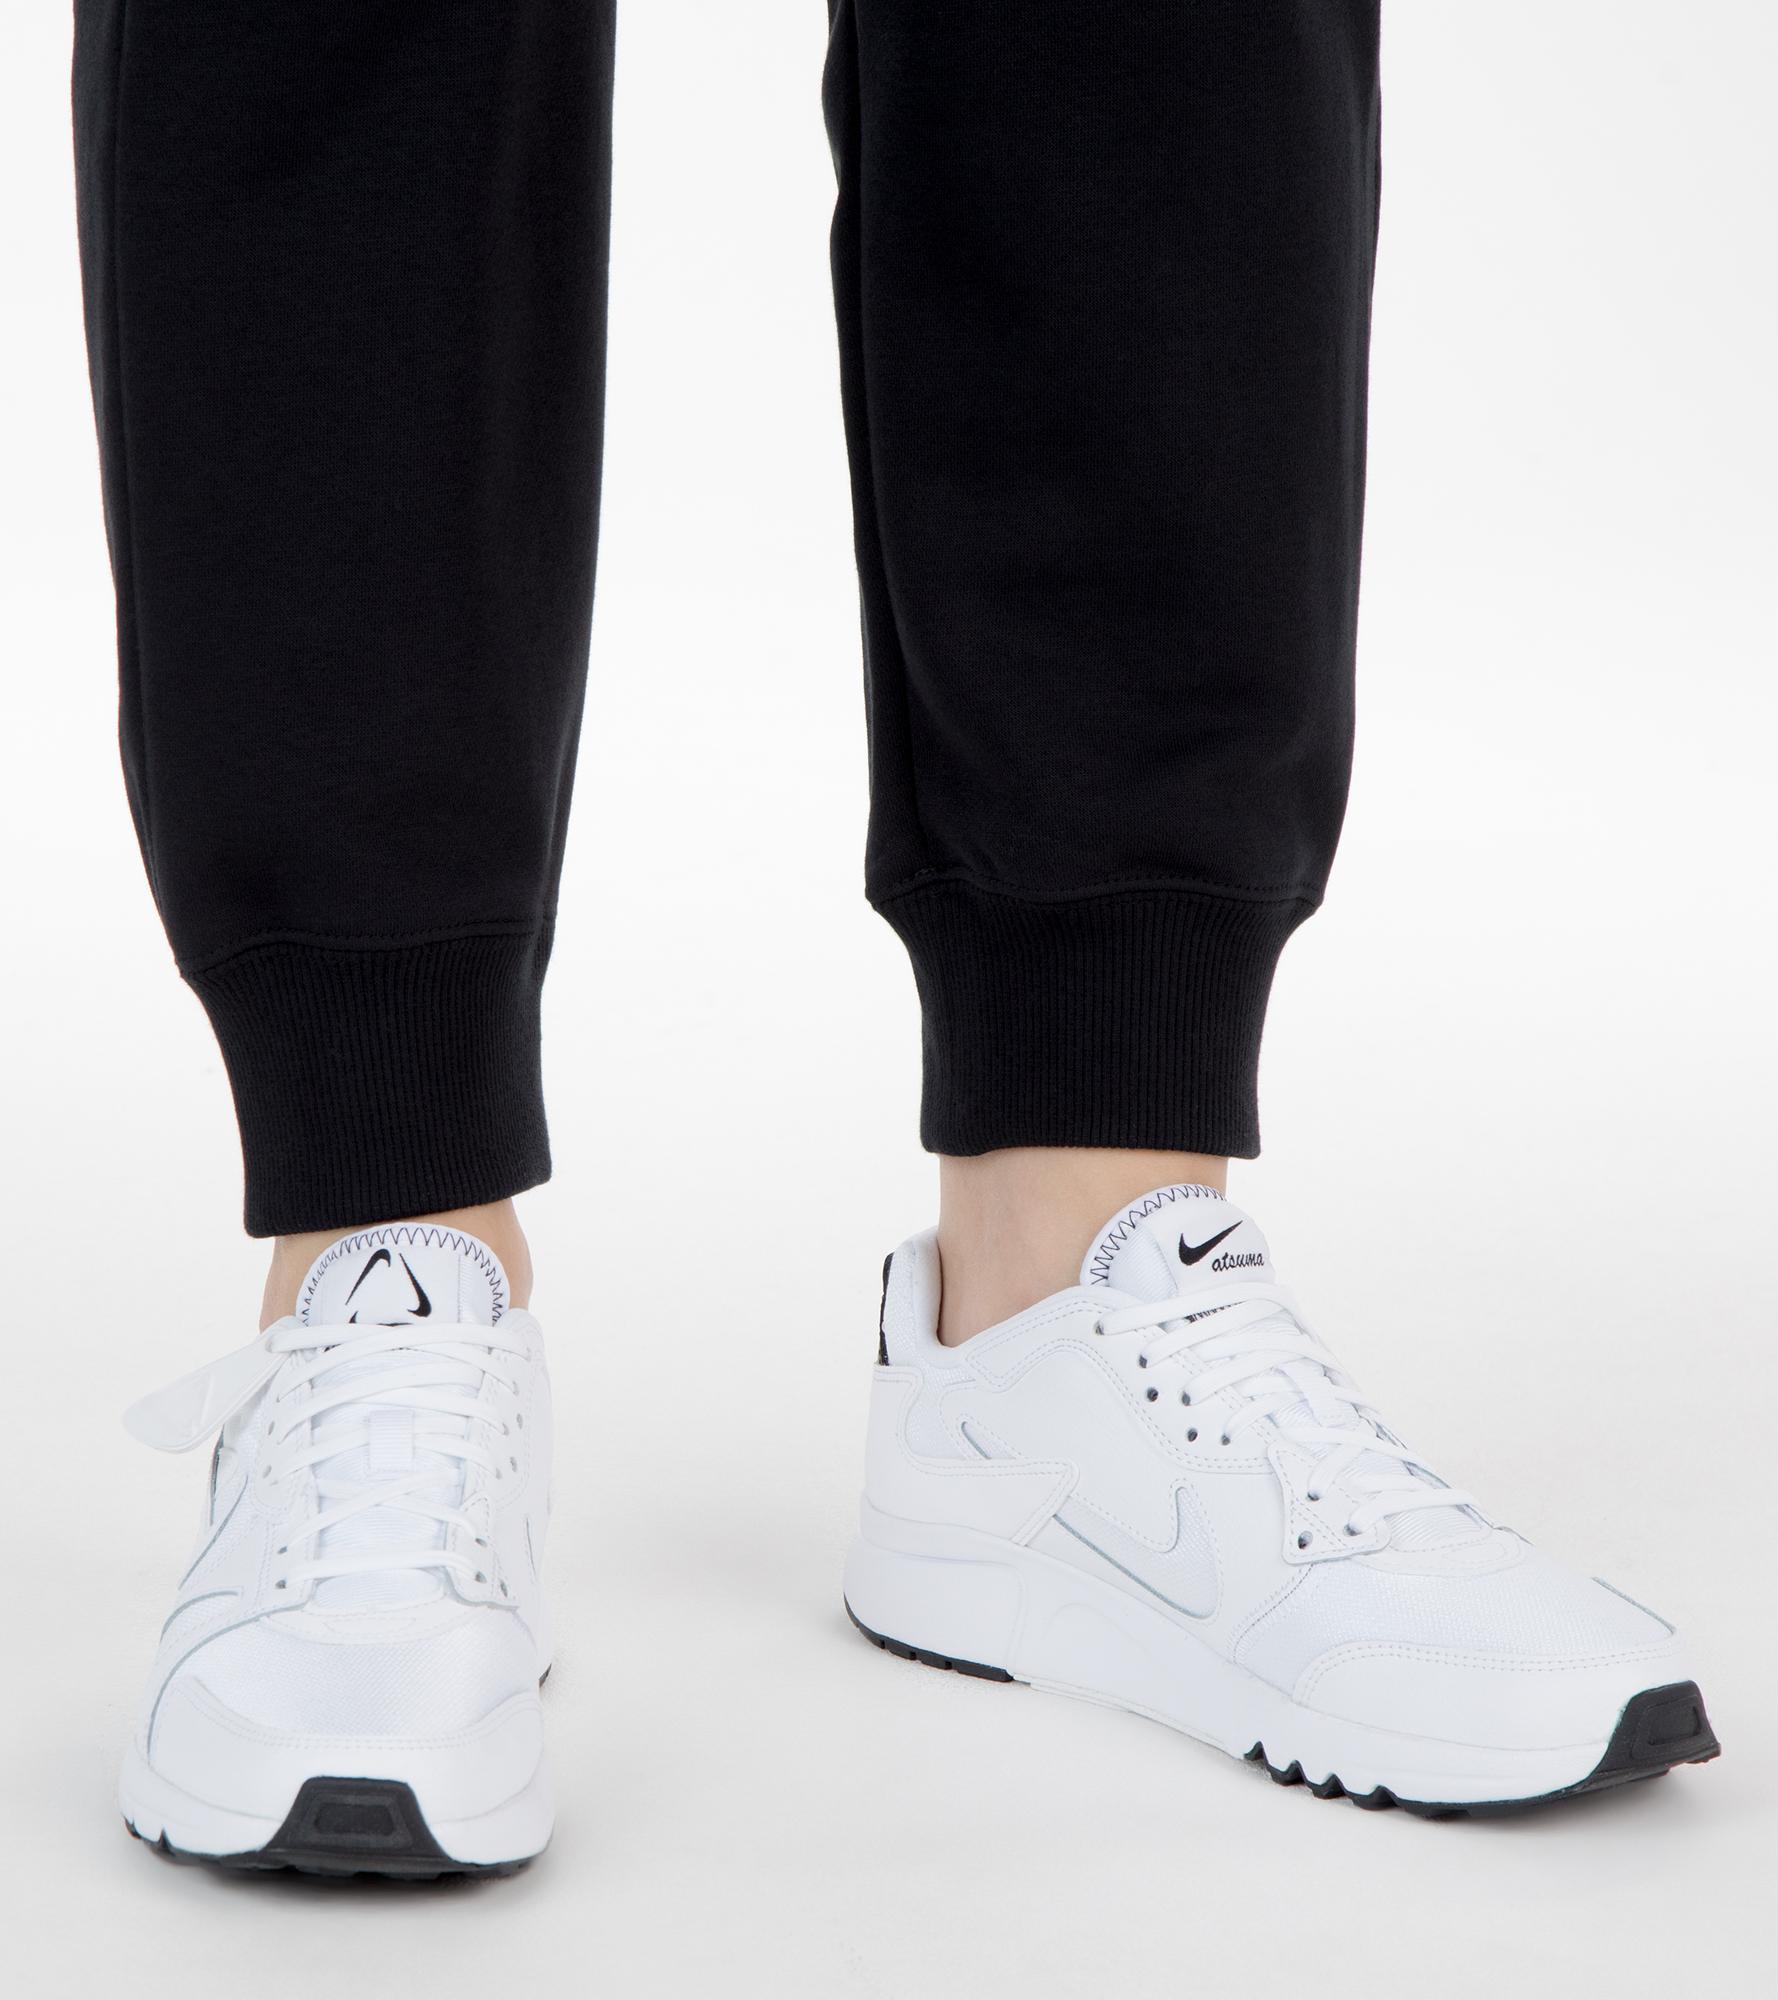 Nike Кроссовки женские Nike Atsuma, размер 37,5